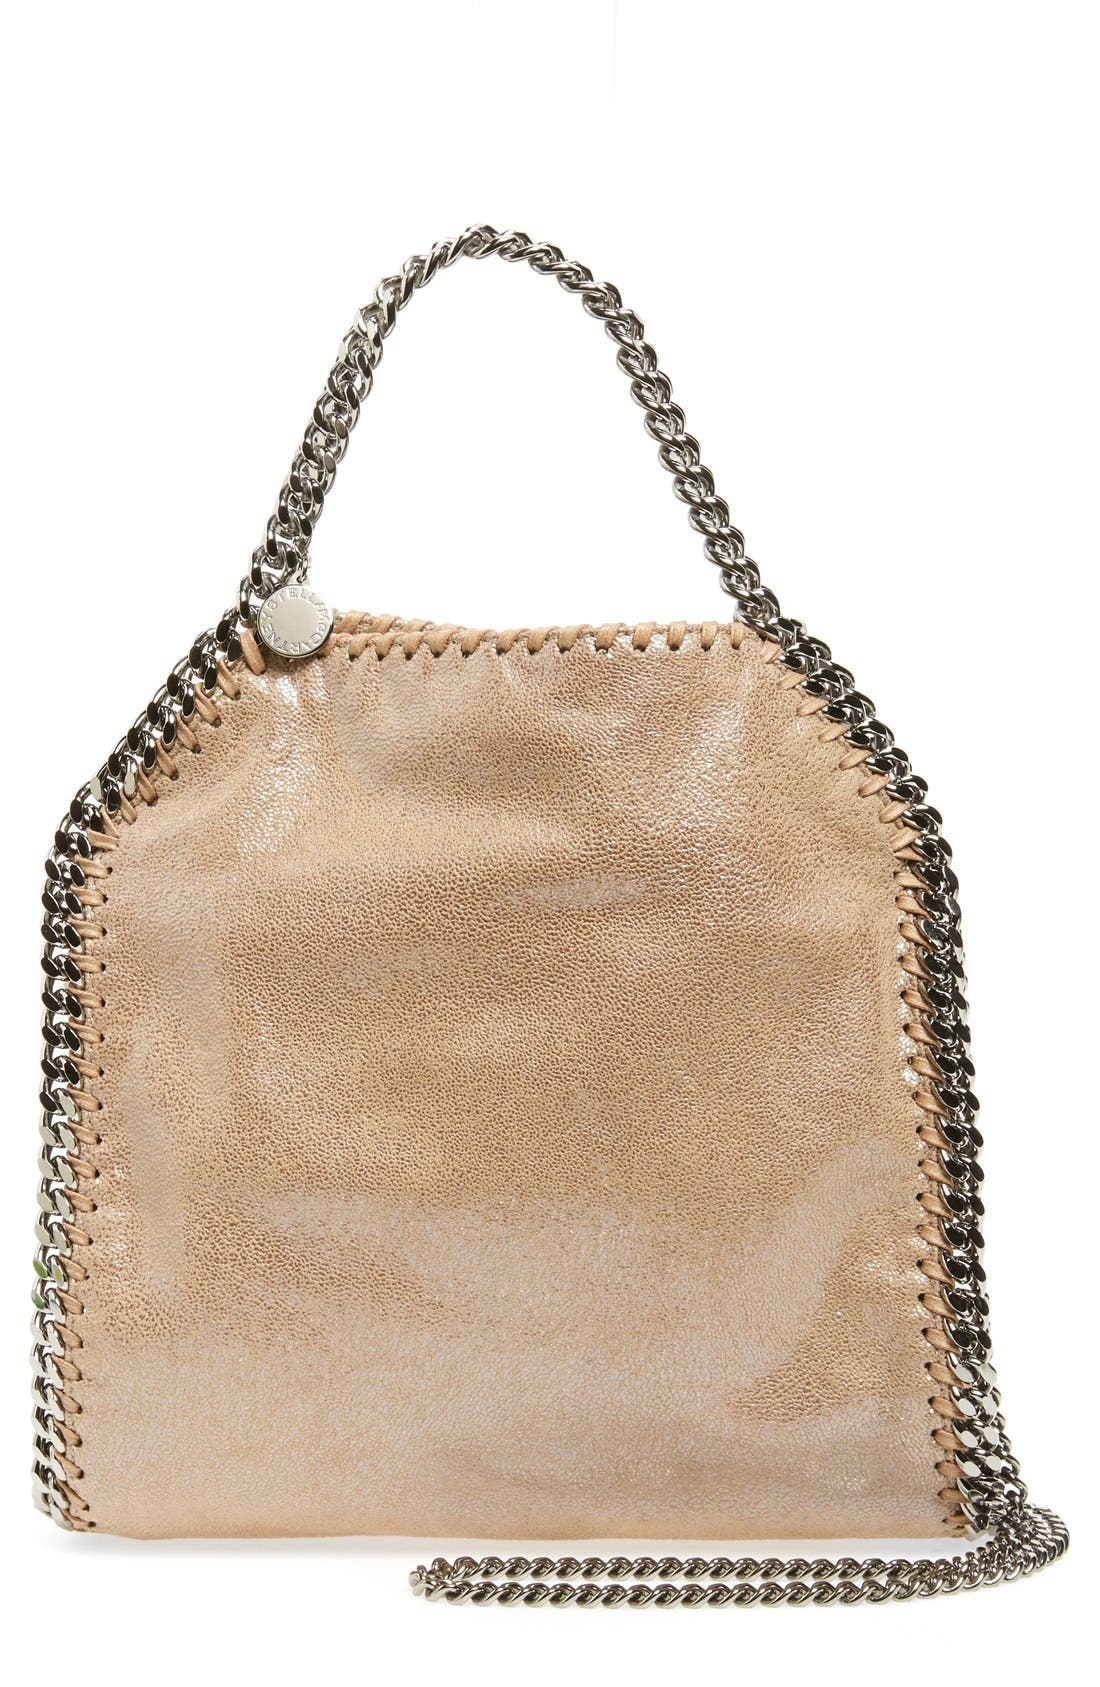 Main Image - Stella McCartney 'Mini Falabella' Faux Leather Crossbody Bag